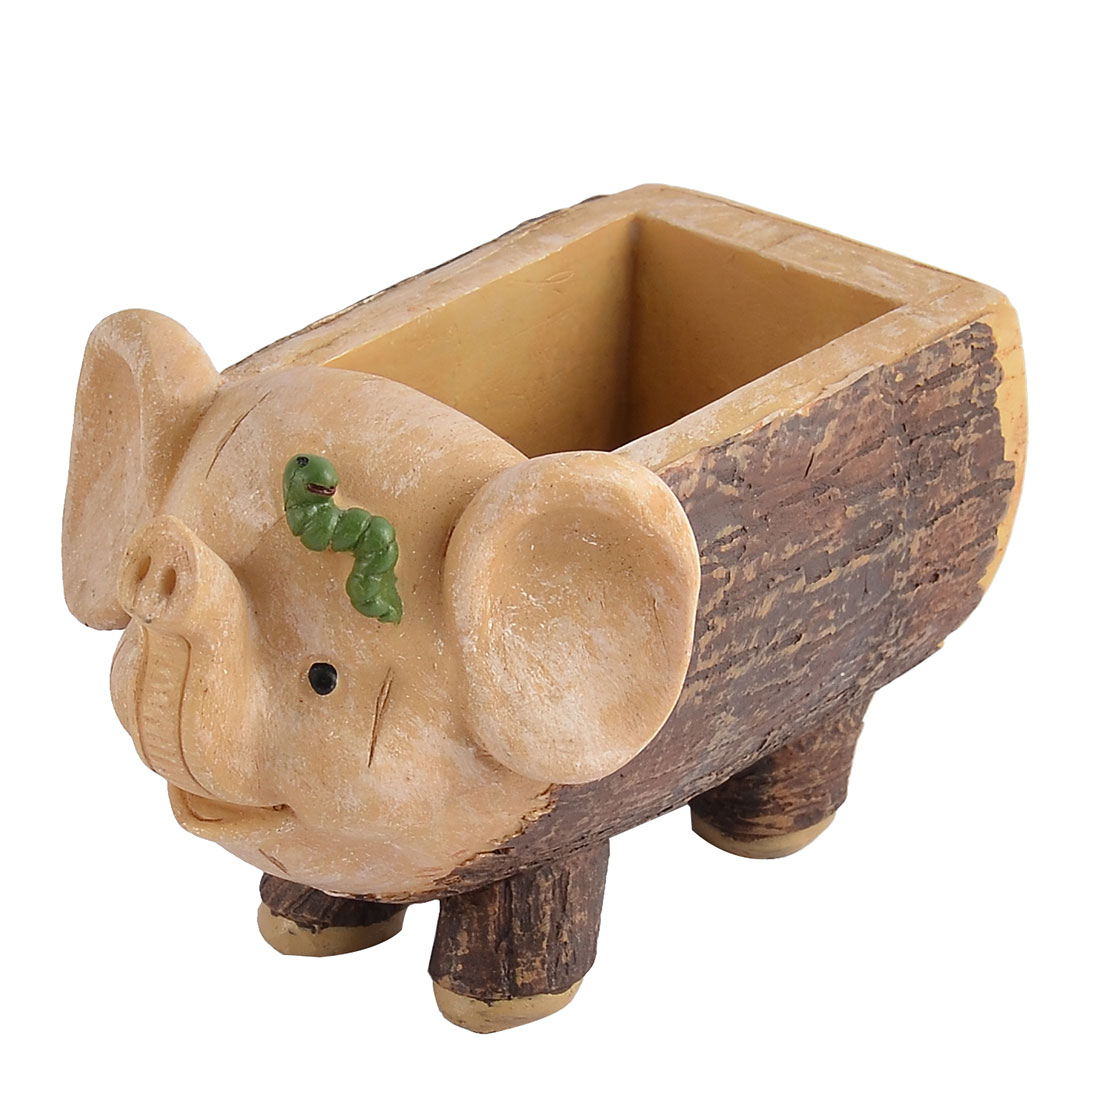 Home Office Desk Ornament Resin Mini Elephant Shaped Plant Flower Pot